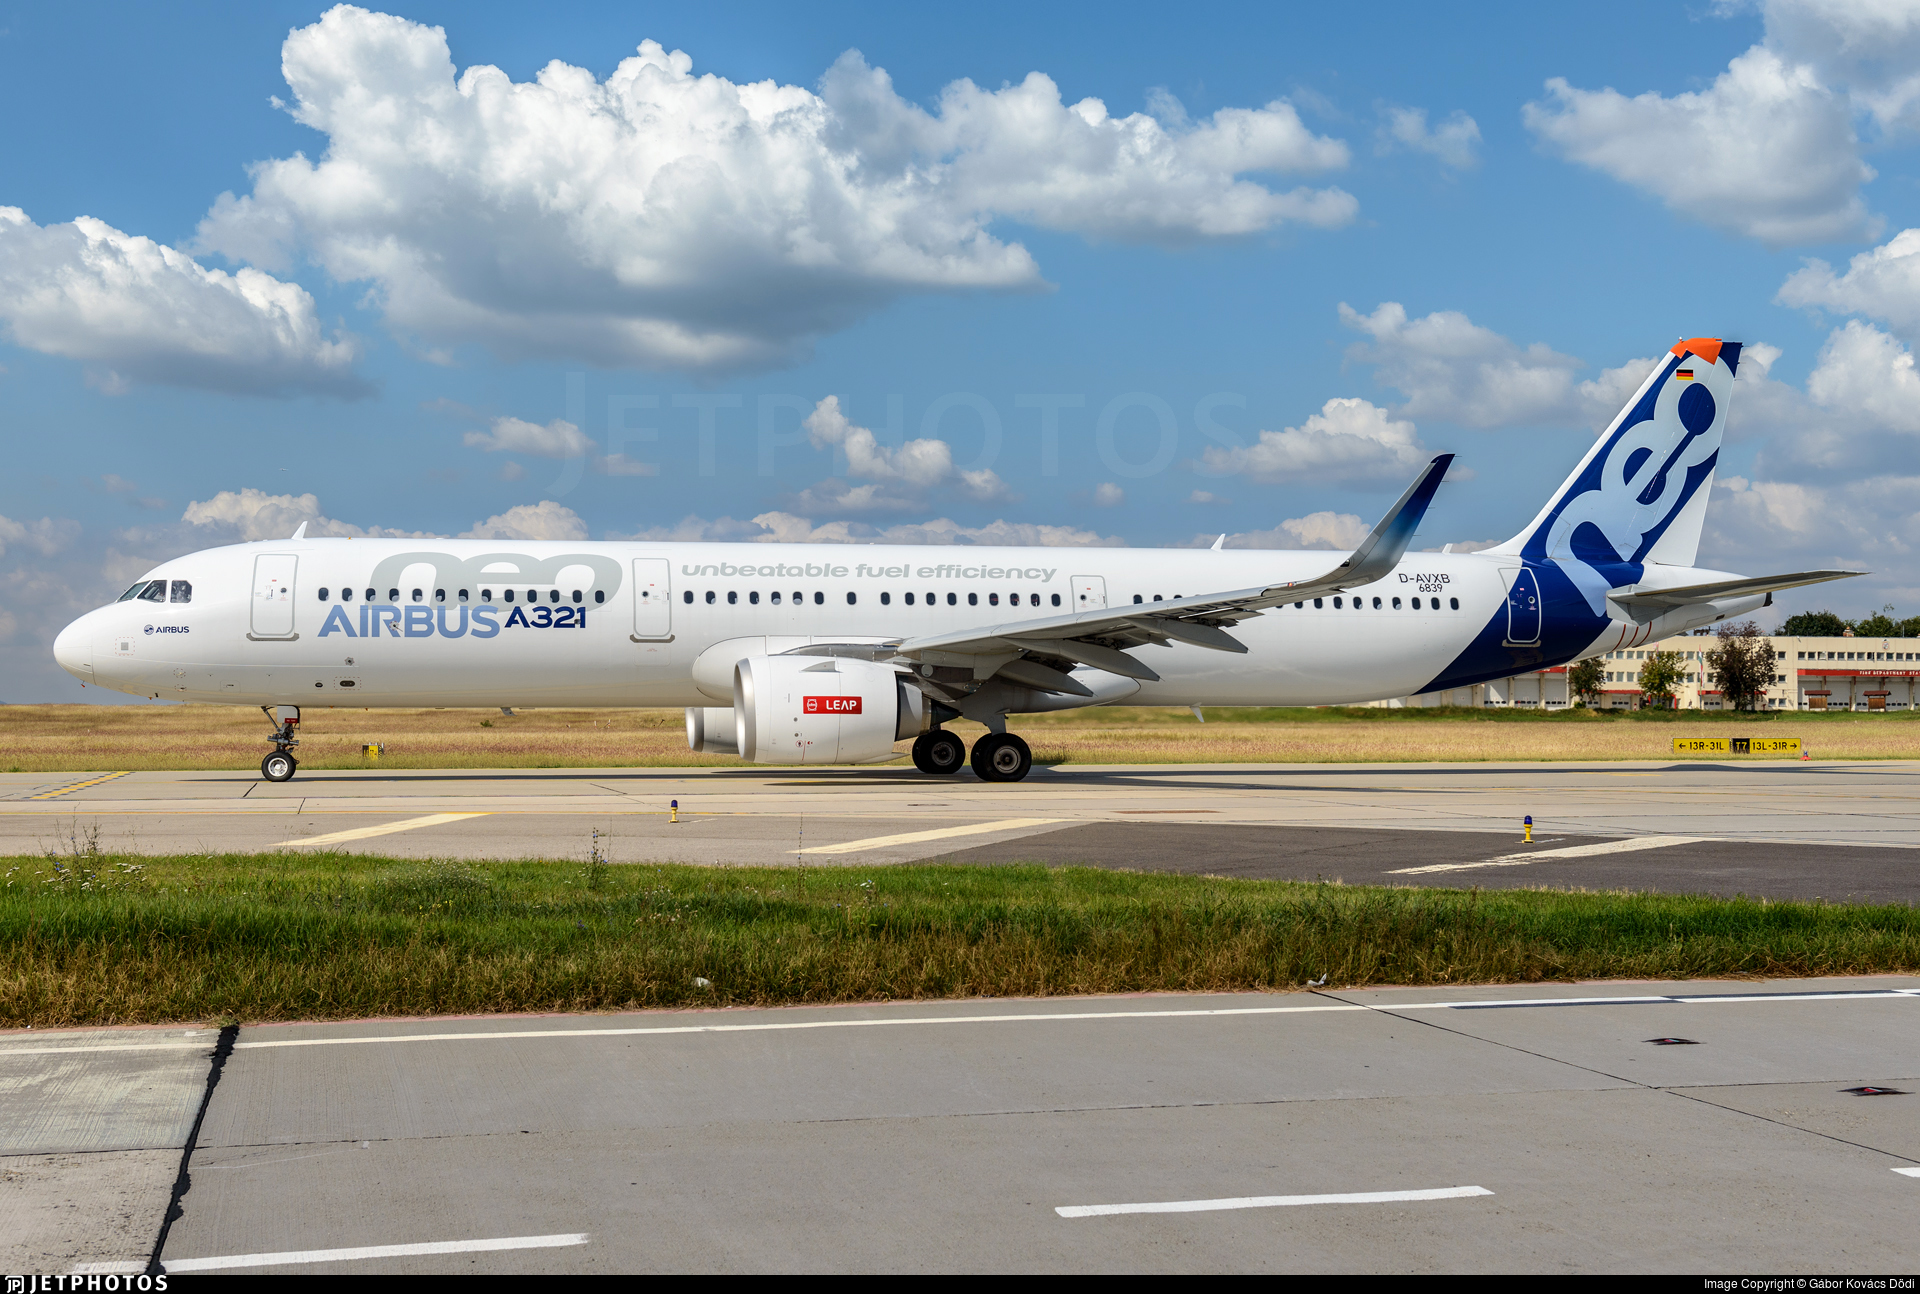 D-AVXB - Airbus A321-251N - Airbus Industrie